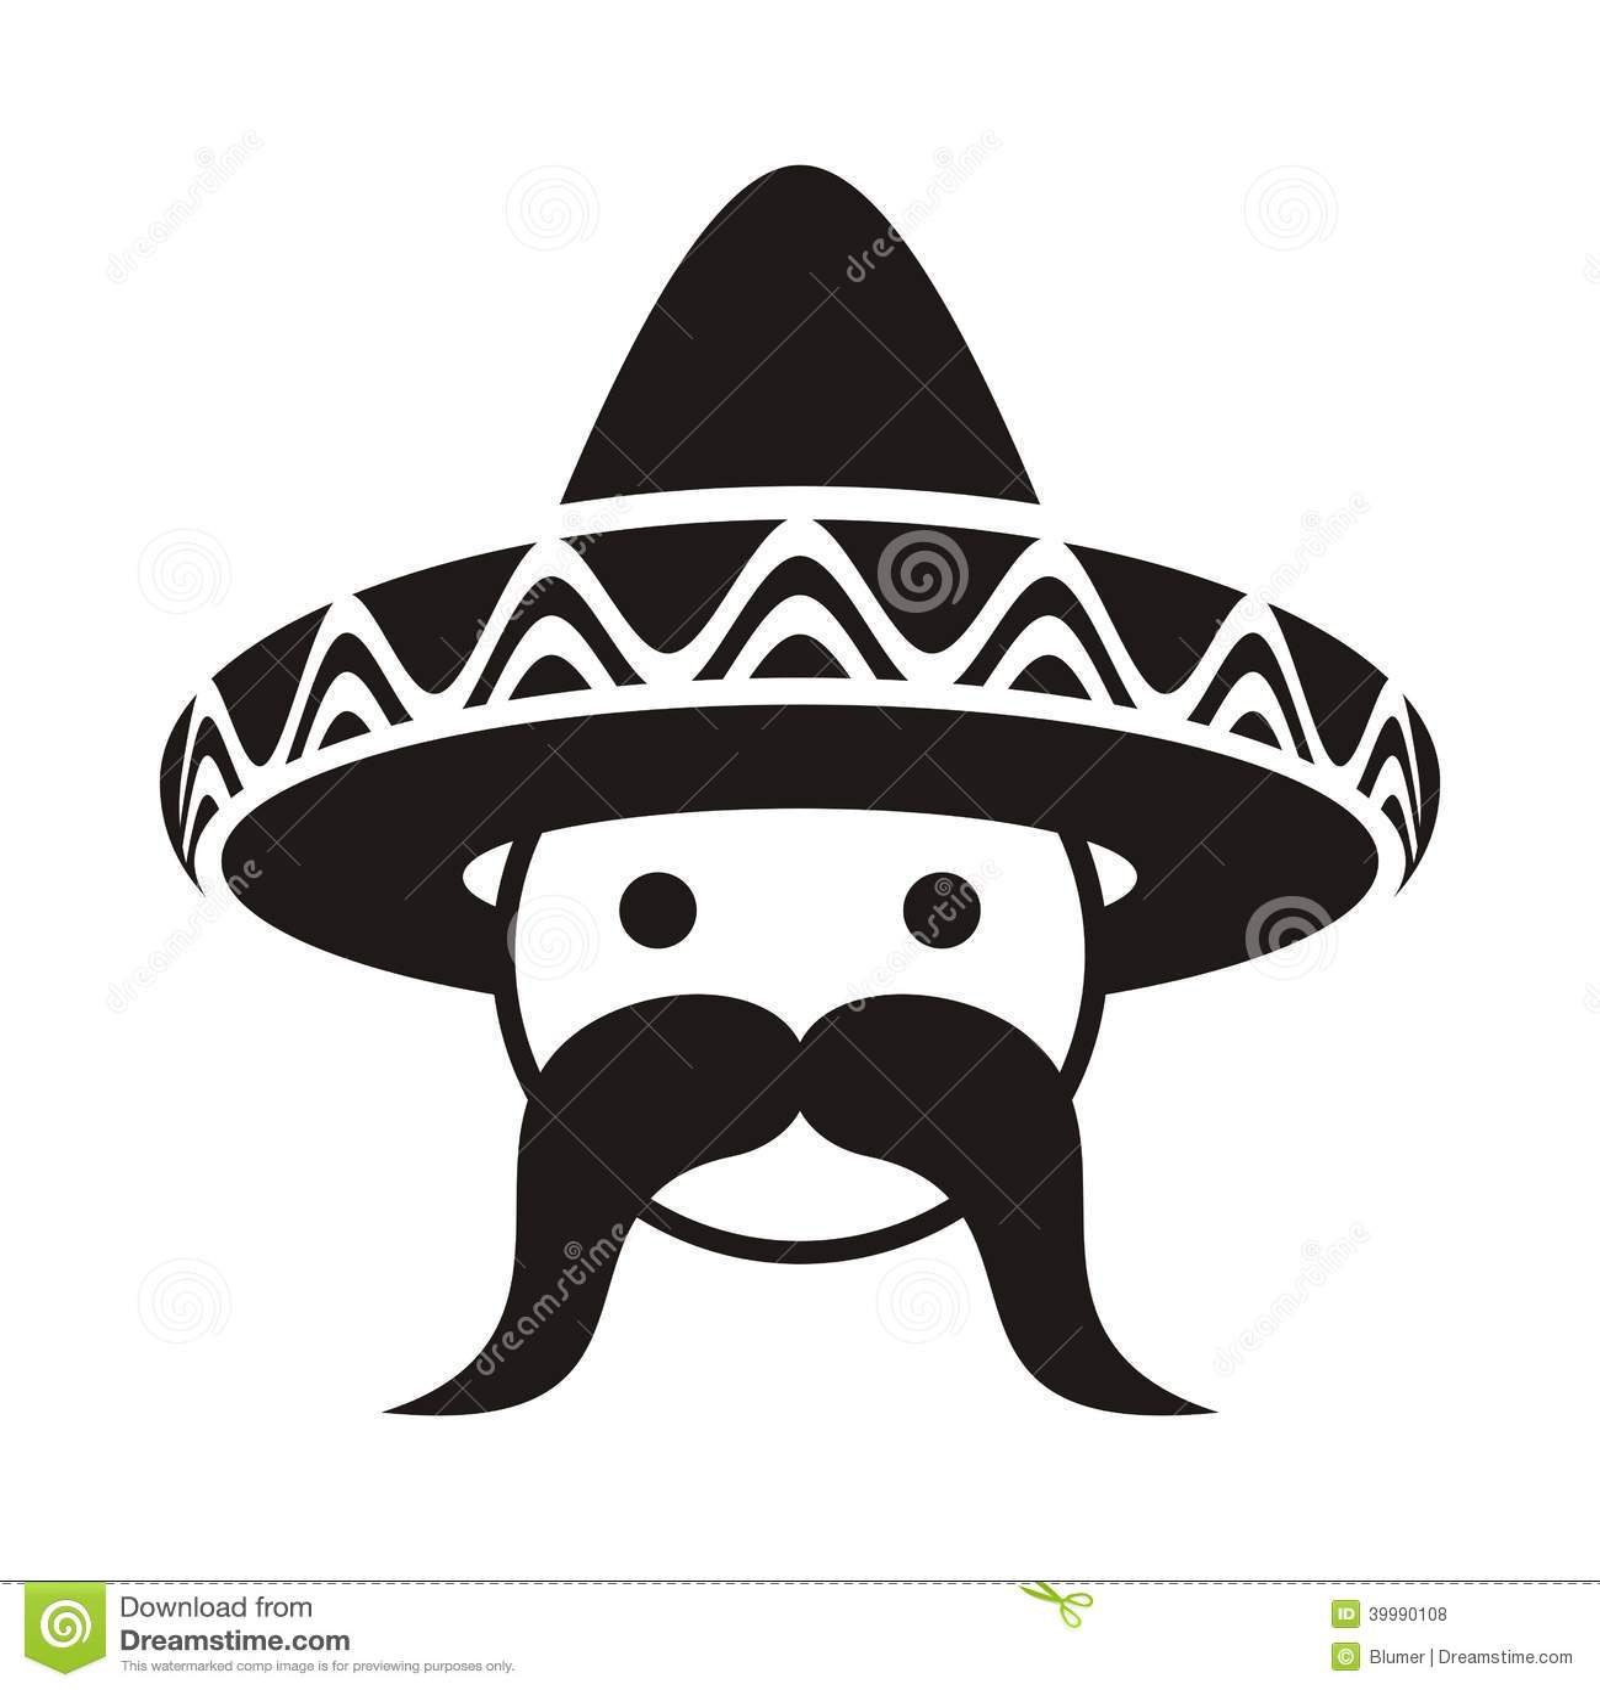 Man With Sombrero Stock Vector - Image: 39990108